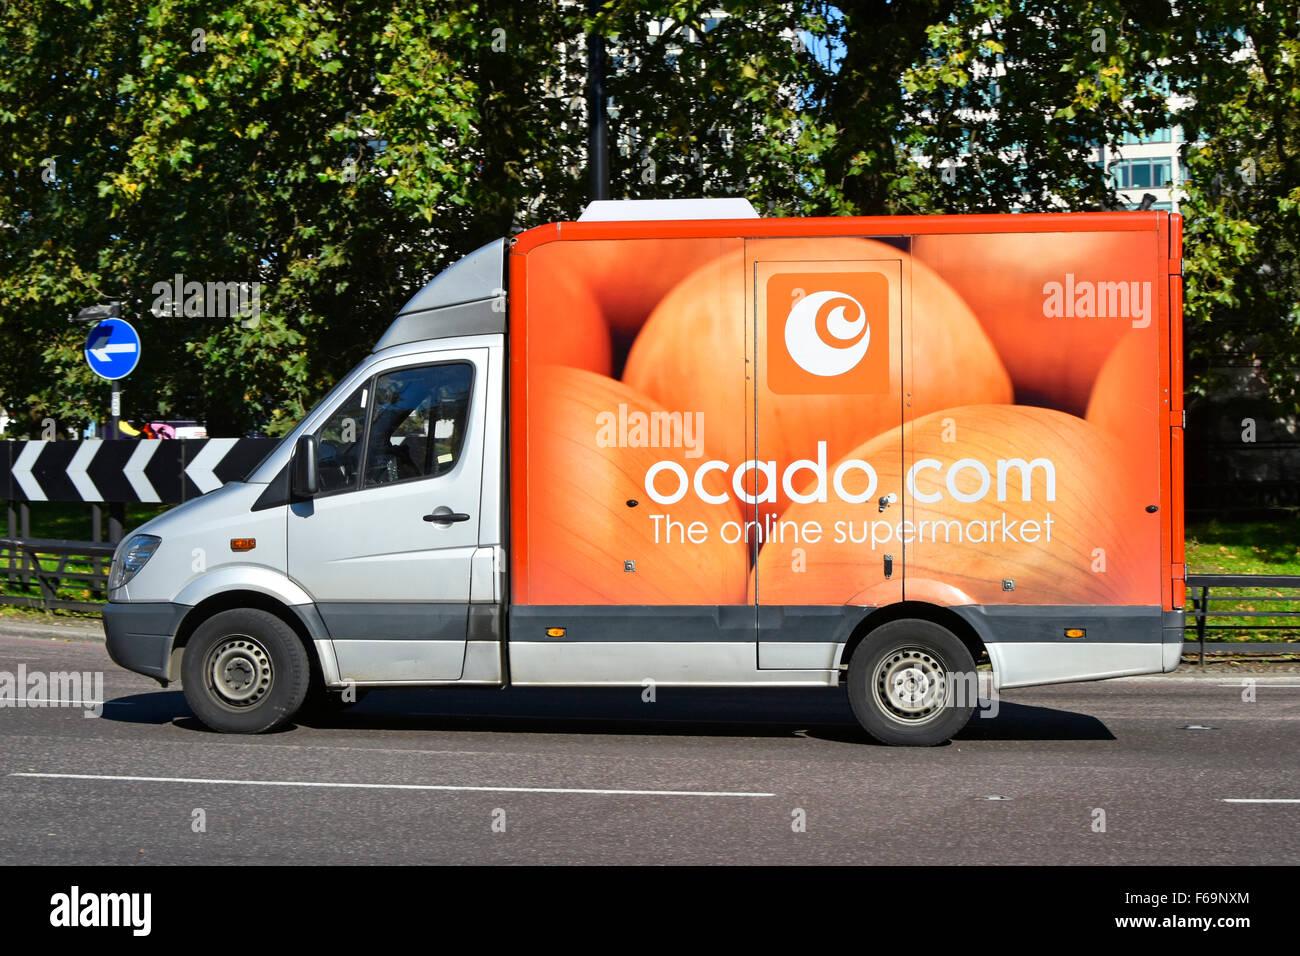 Ocado delivery van online internet food shopping supermarket